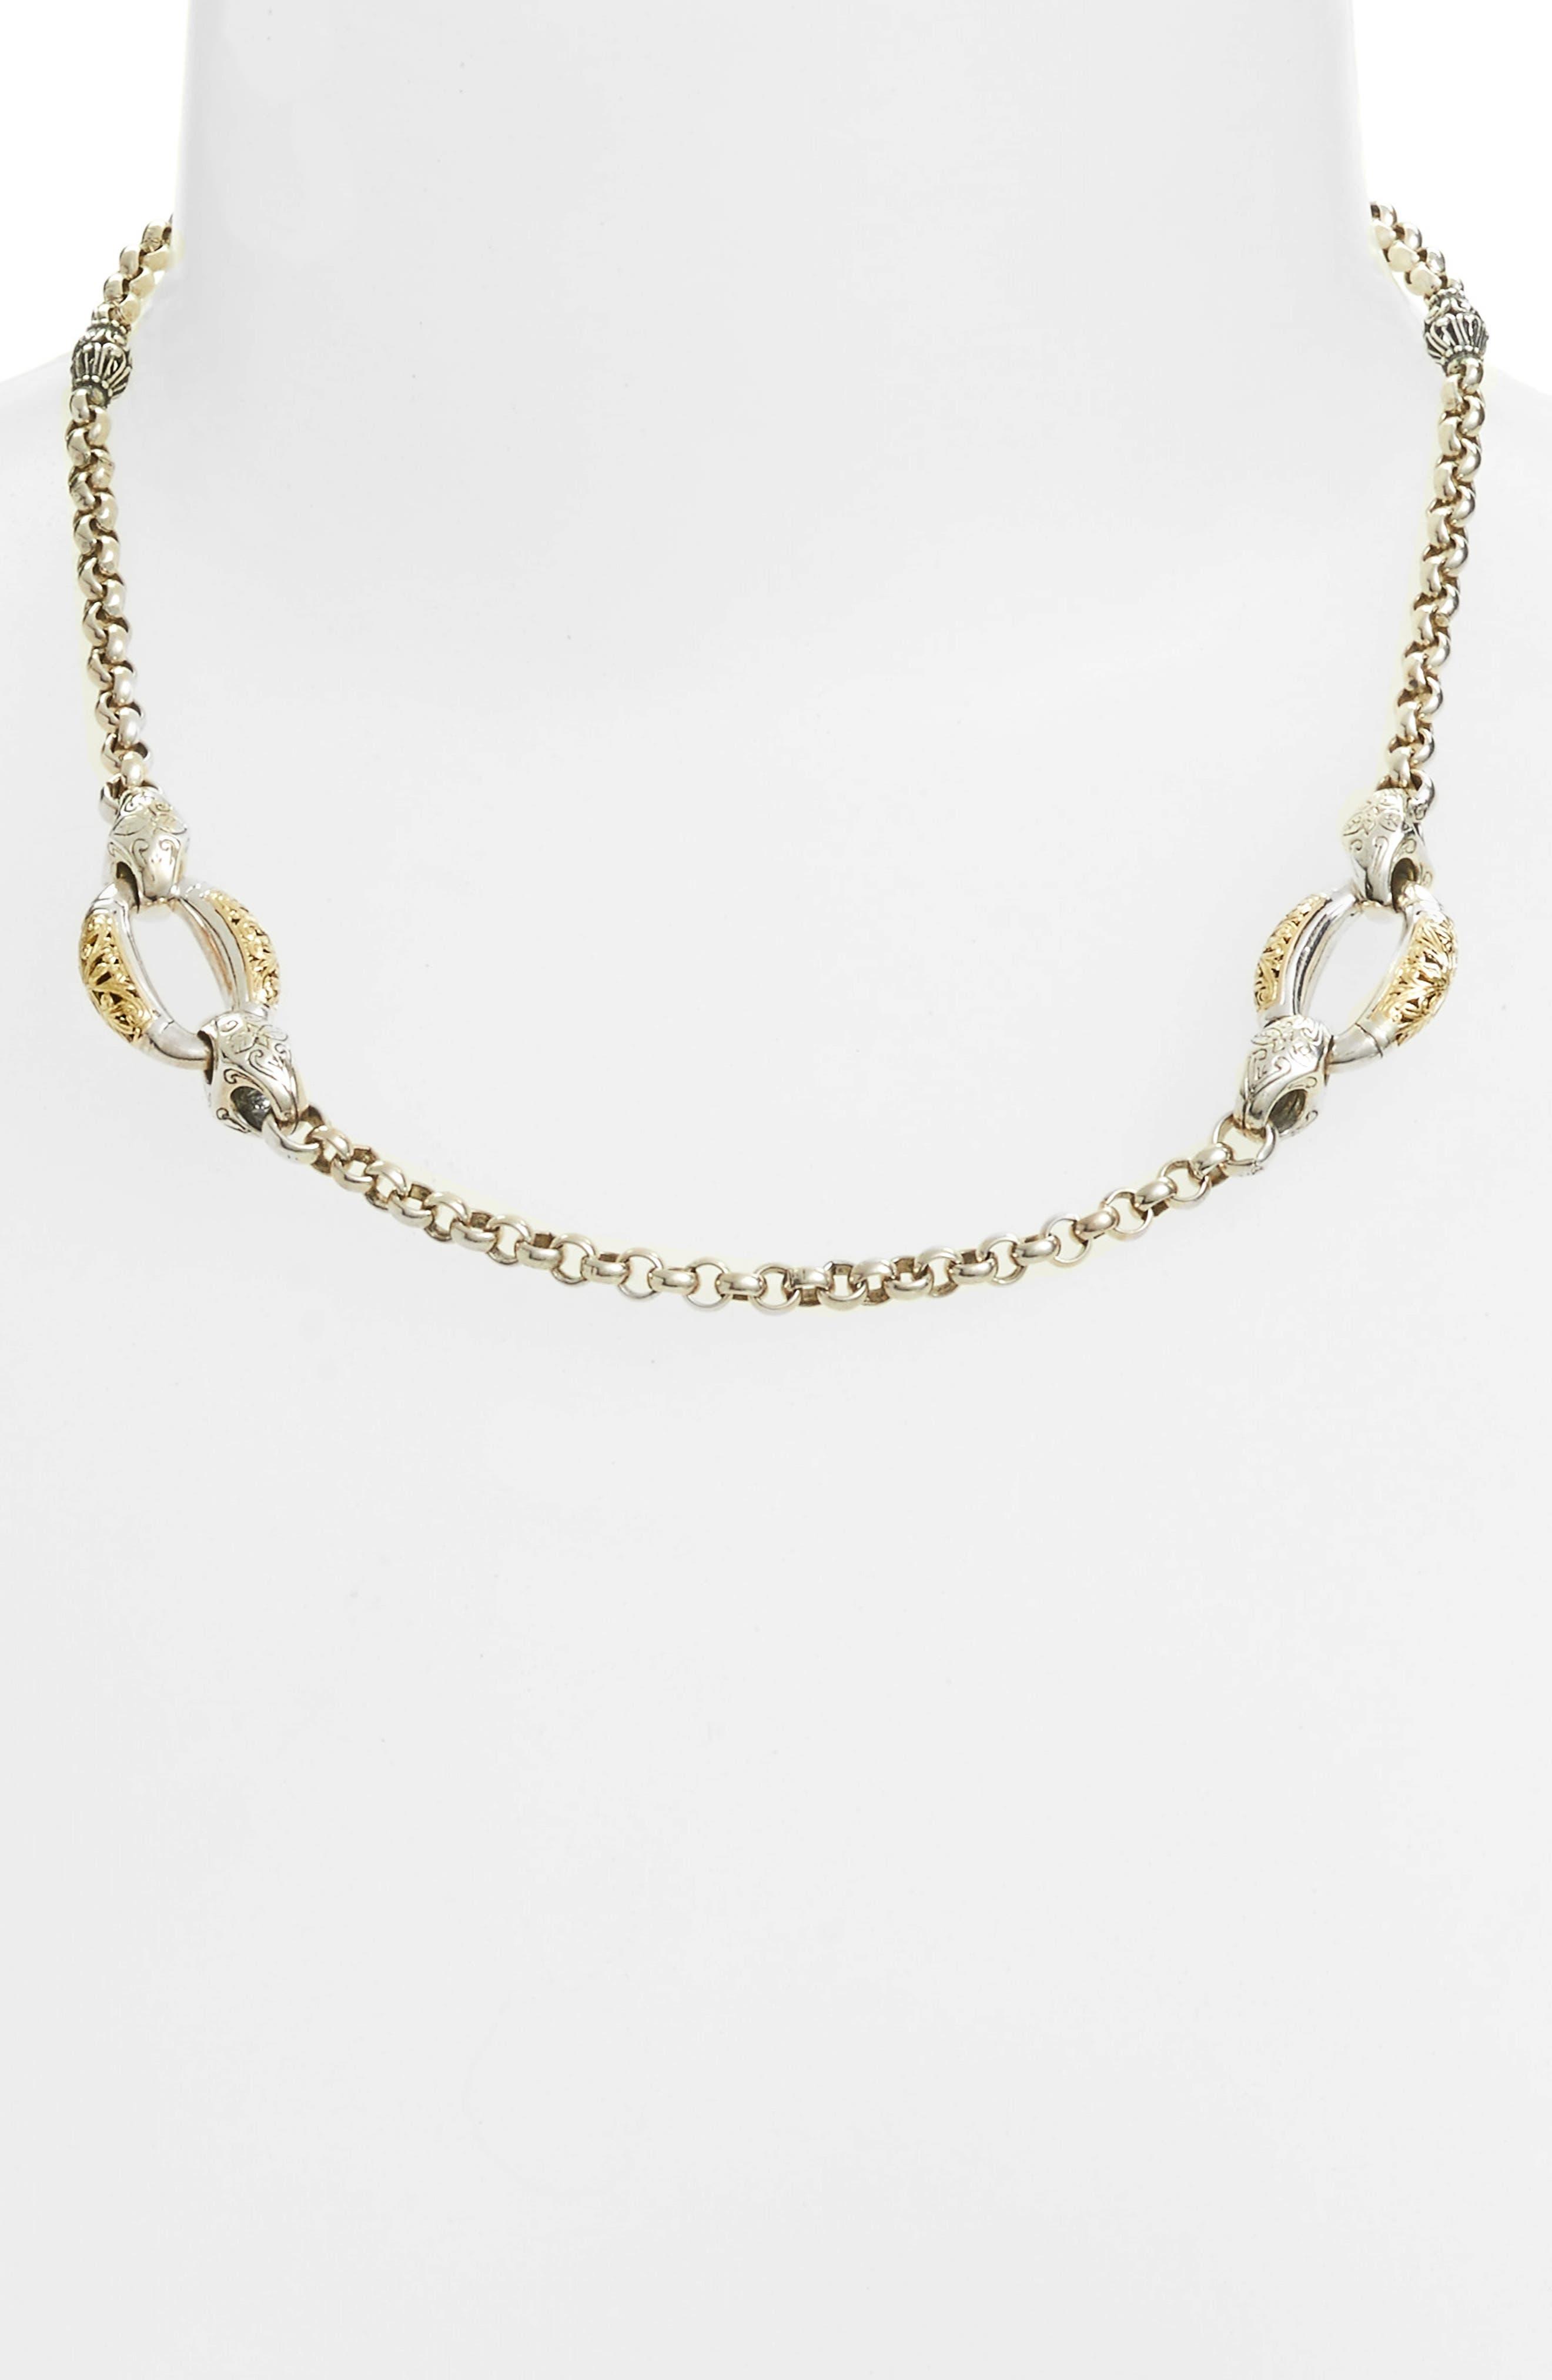 Classics Daphne Link Necklace,                             Alternate thumbnail 2, color,                             SILVER/ GOLD